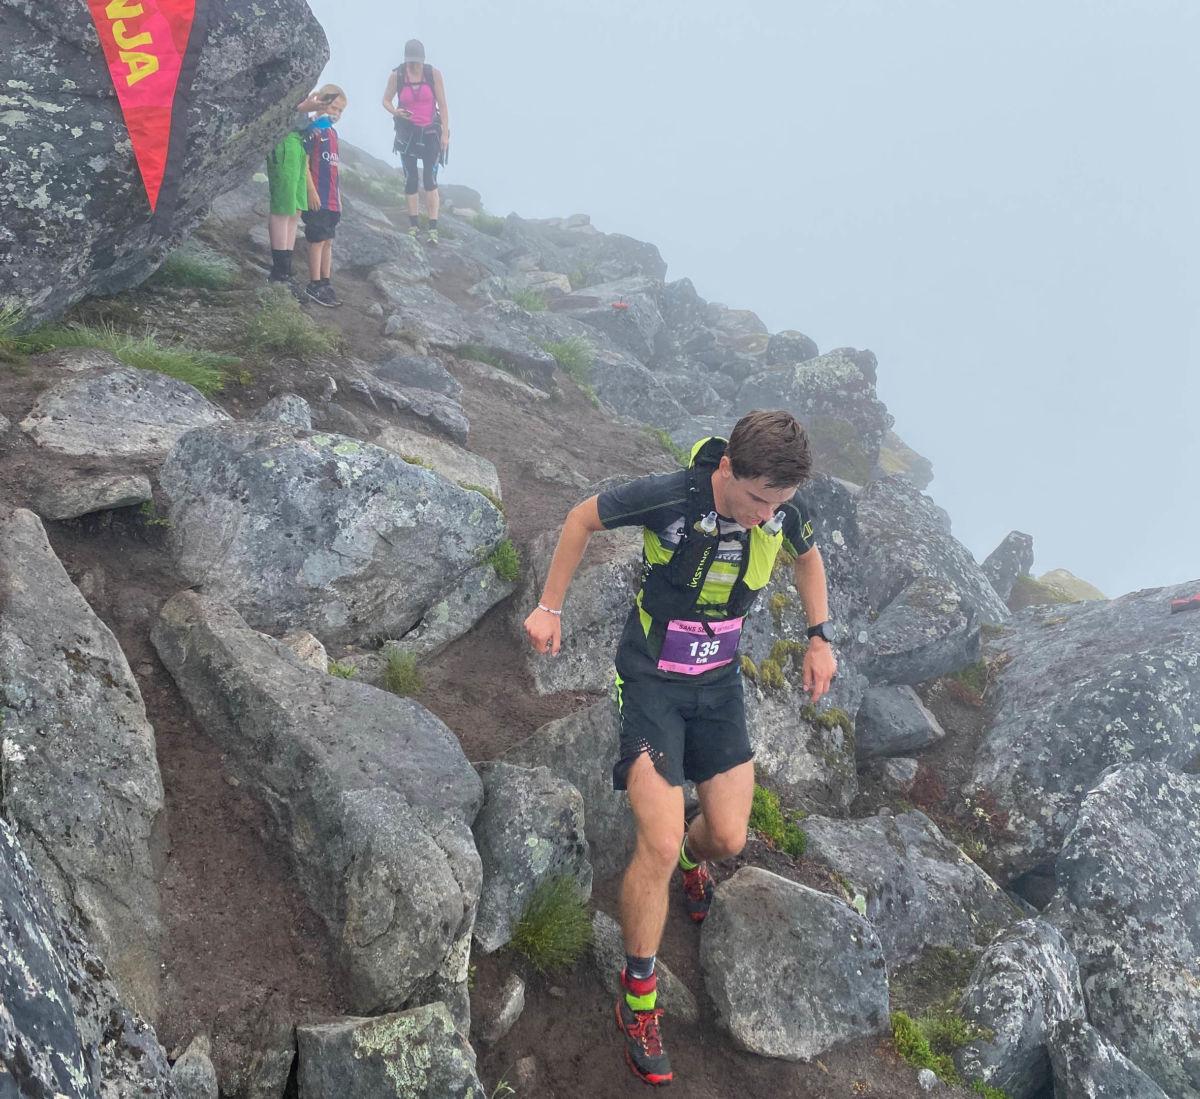 Erik Kårvatn sikra seg ein sterk 4 plass i dagens løp - det lover bra for Kårvatn SkyRun i august.  Foto: G.Kårvatn